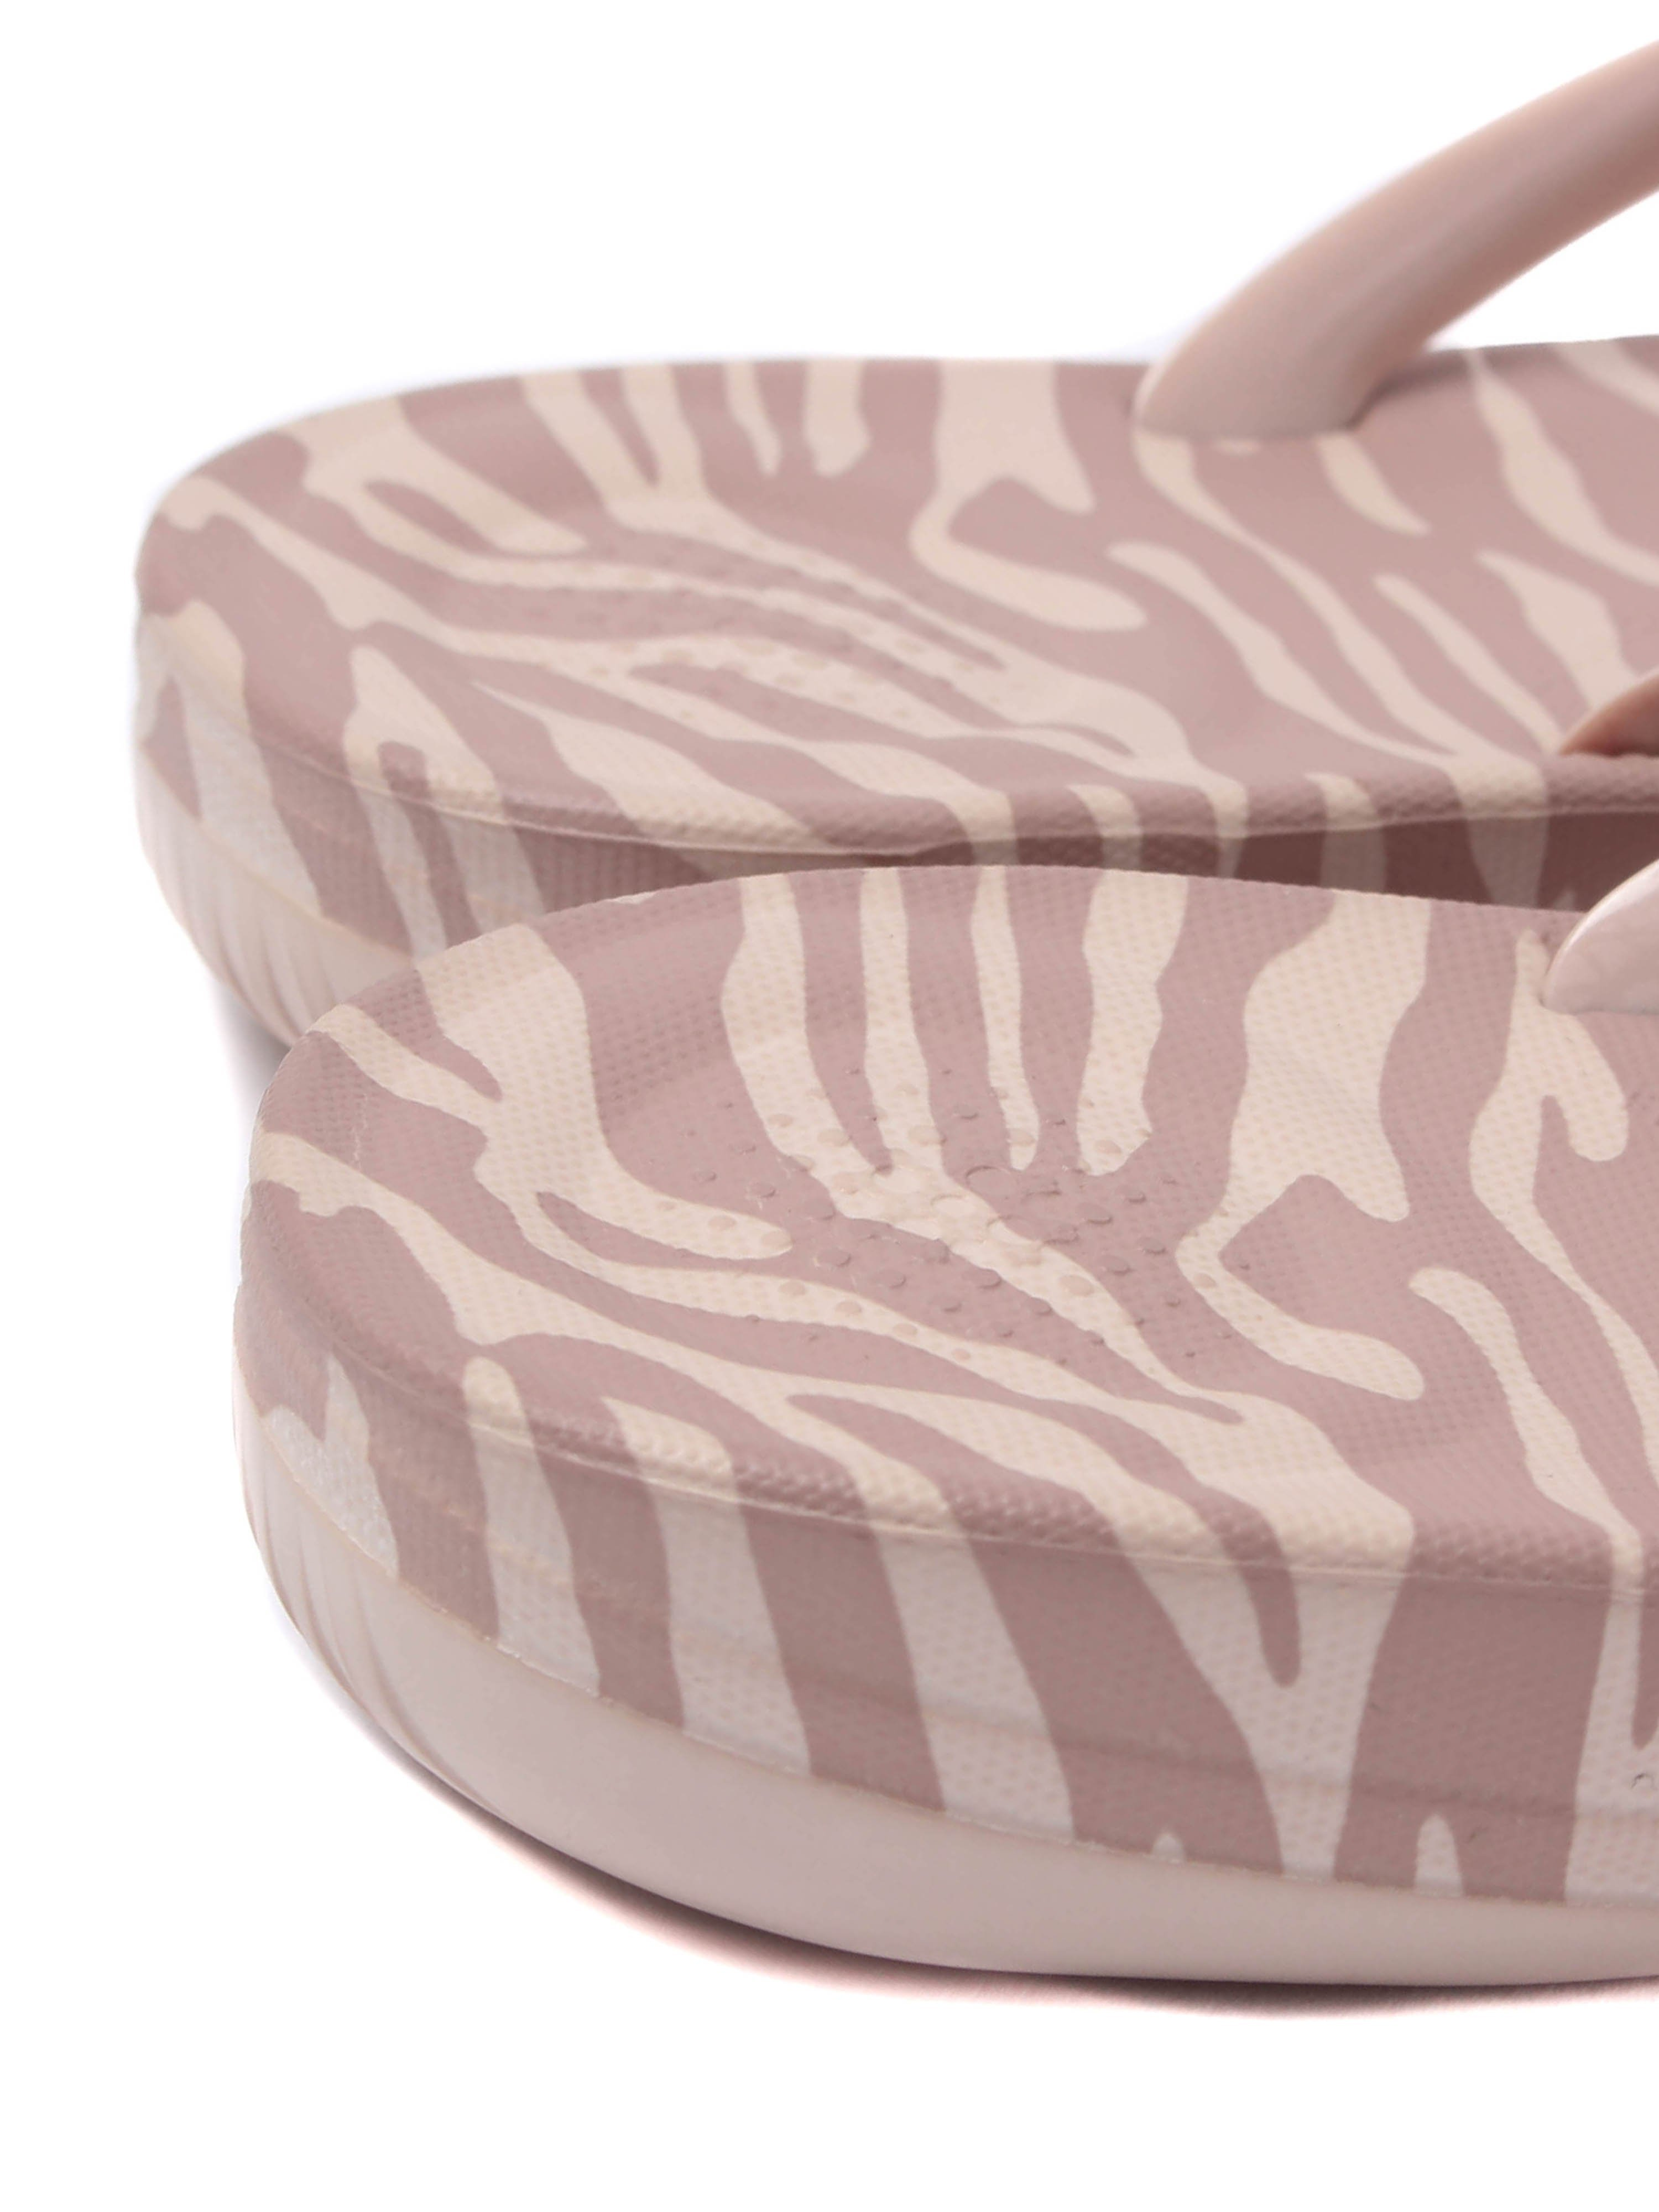 FitFlop Women's IQushion Ergonomic Flip Flops - Nude Tiger Print